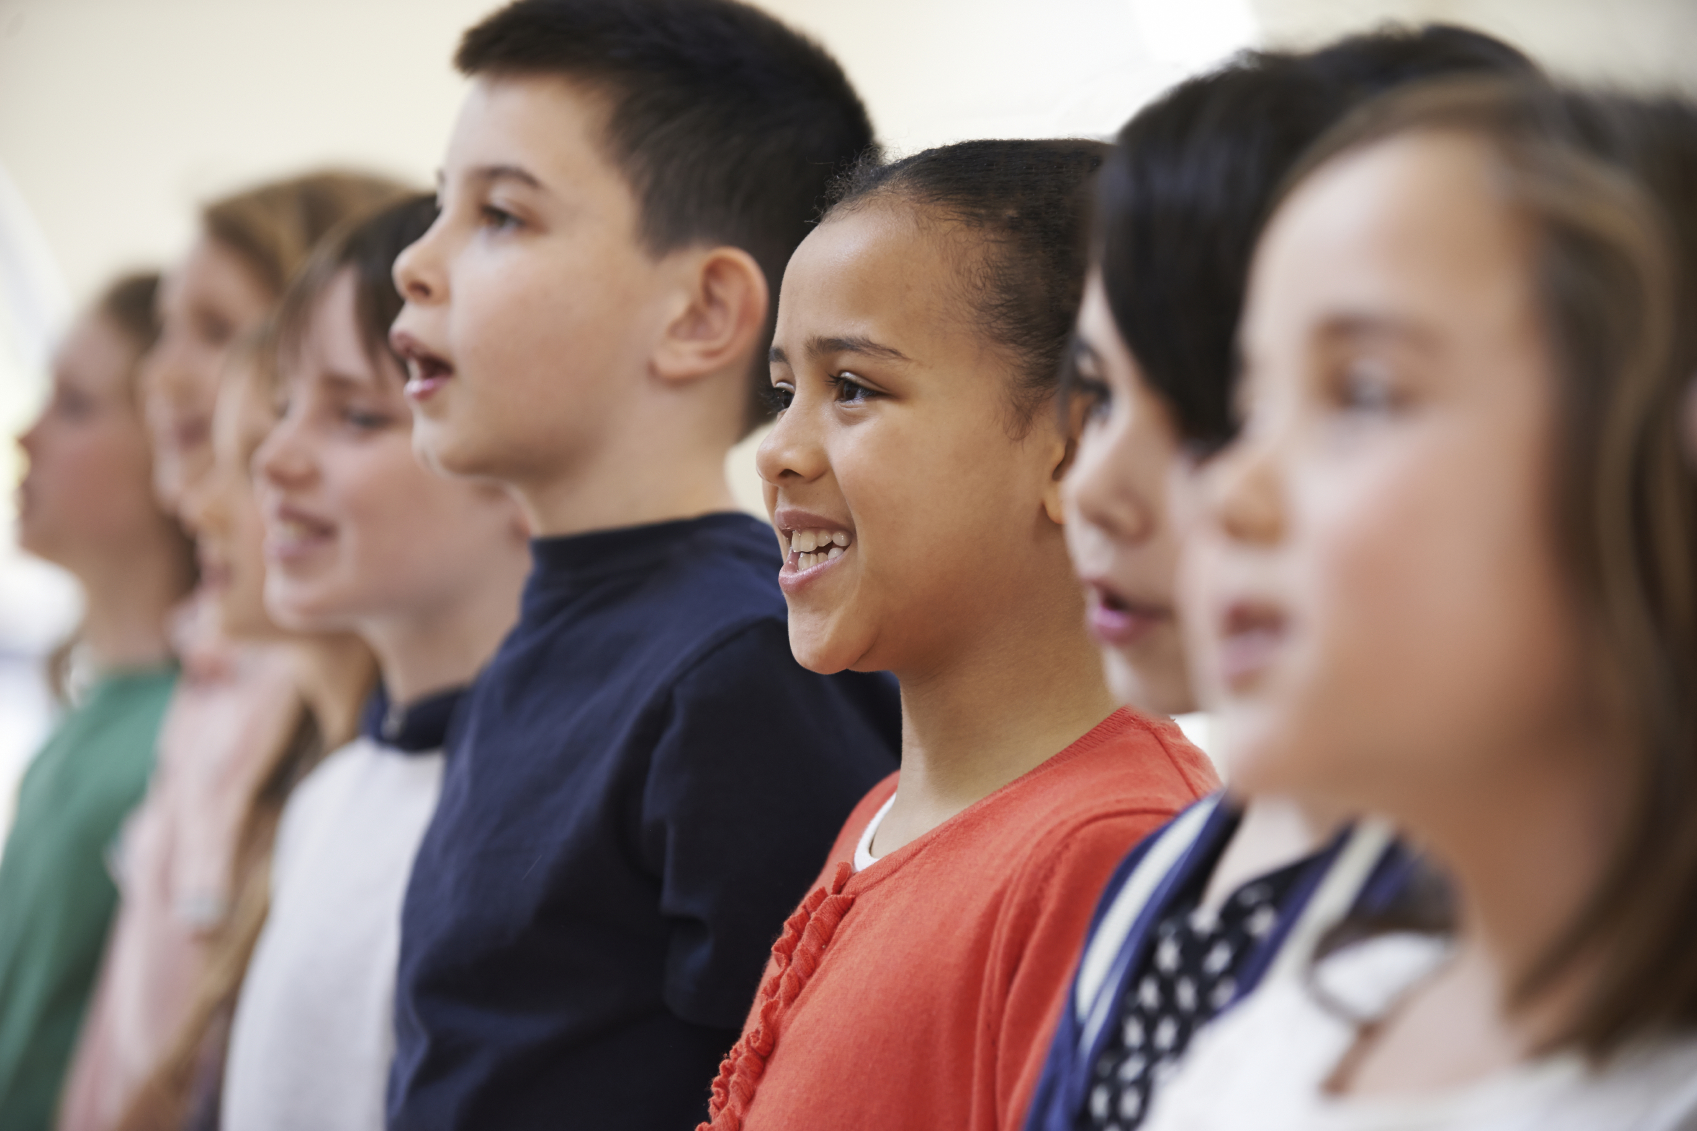 Group-Of-School-Children-Singing-In-Choir-Together-000074903847_Medium.jpg